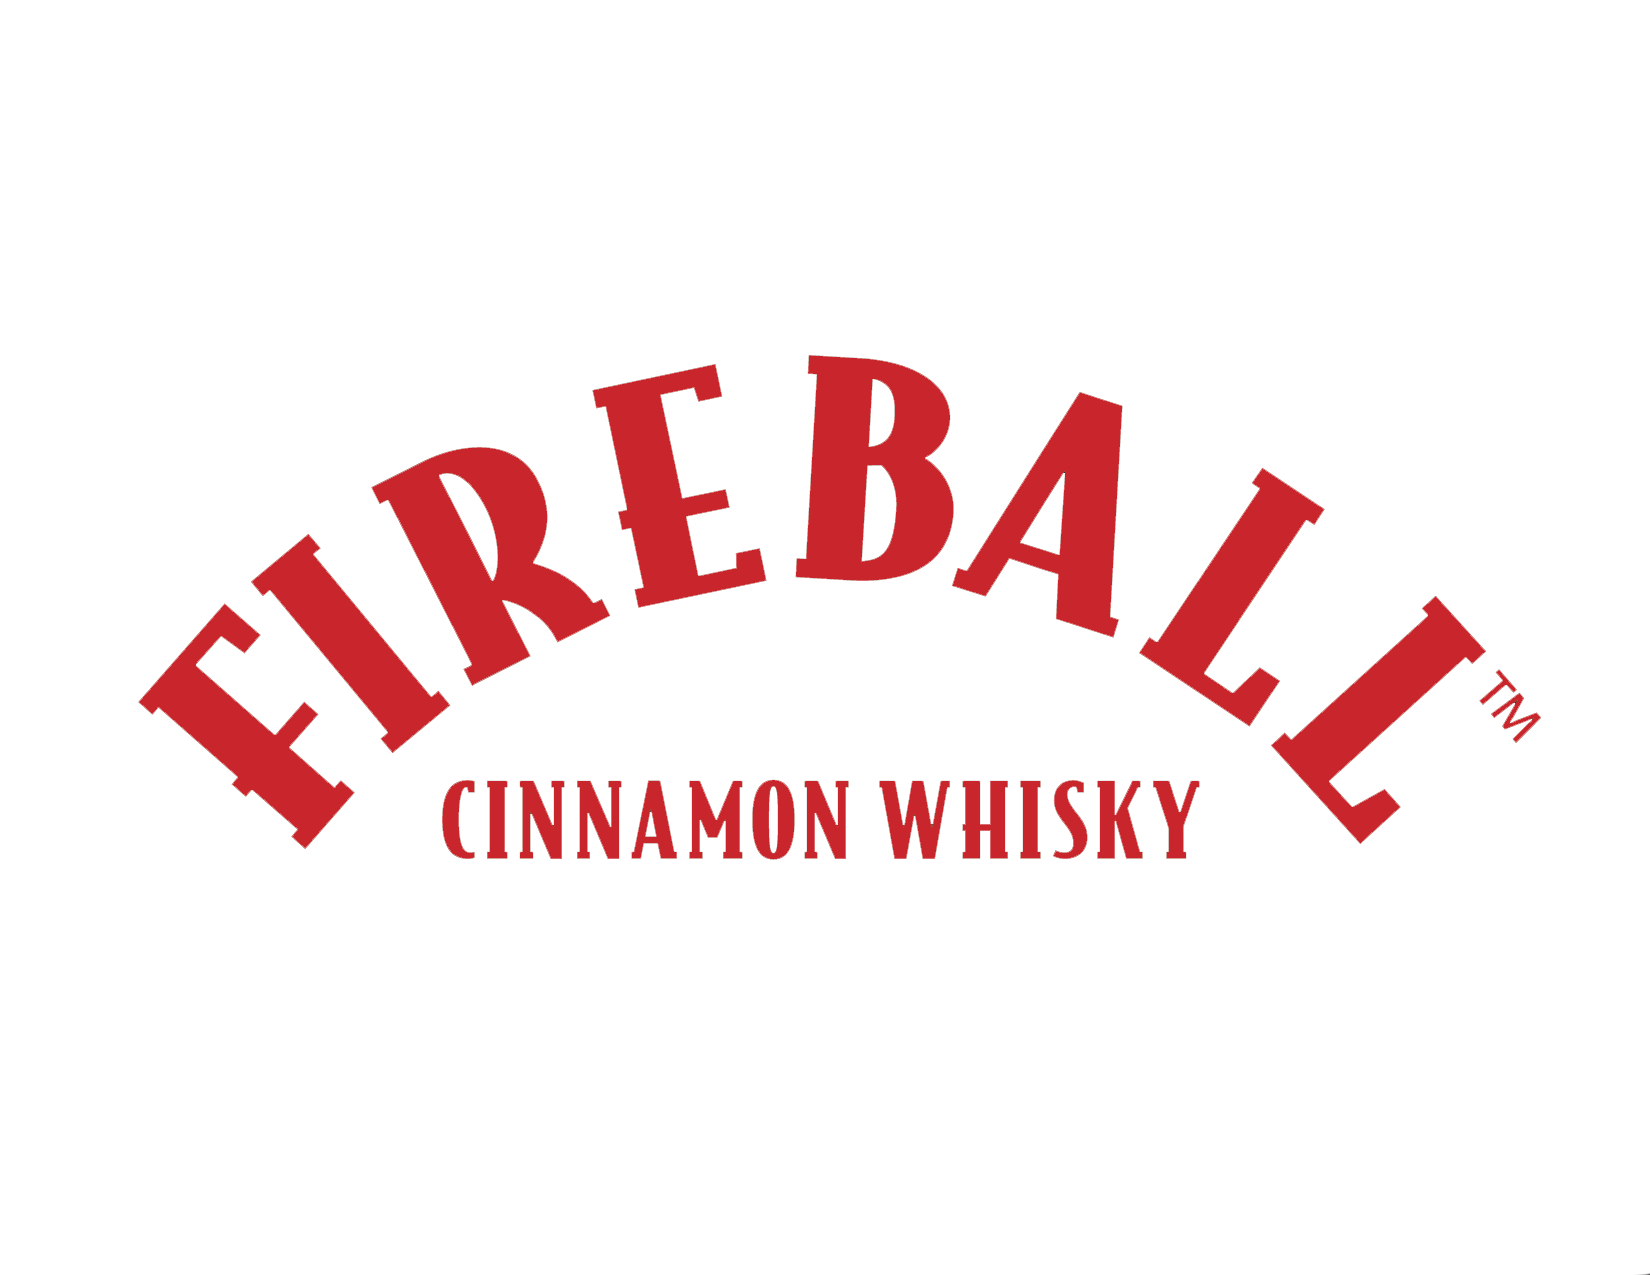 Fireball-Cinnamon-Whisky-Arc-Logo-4c-Red-on-Black-Copy-Copy.png